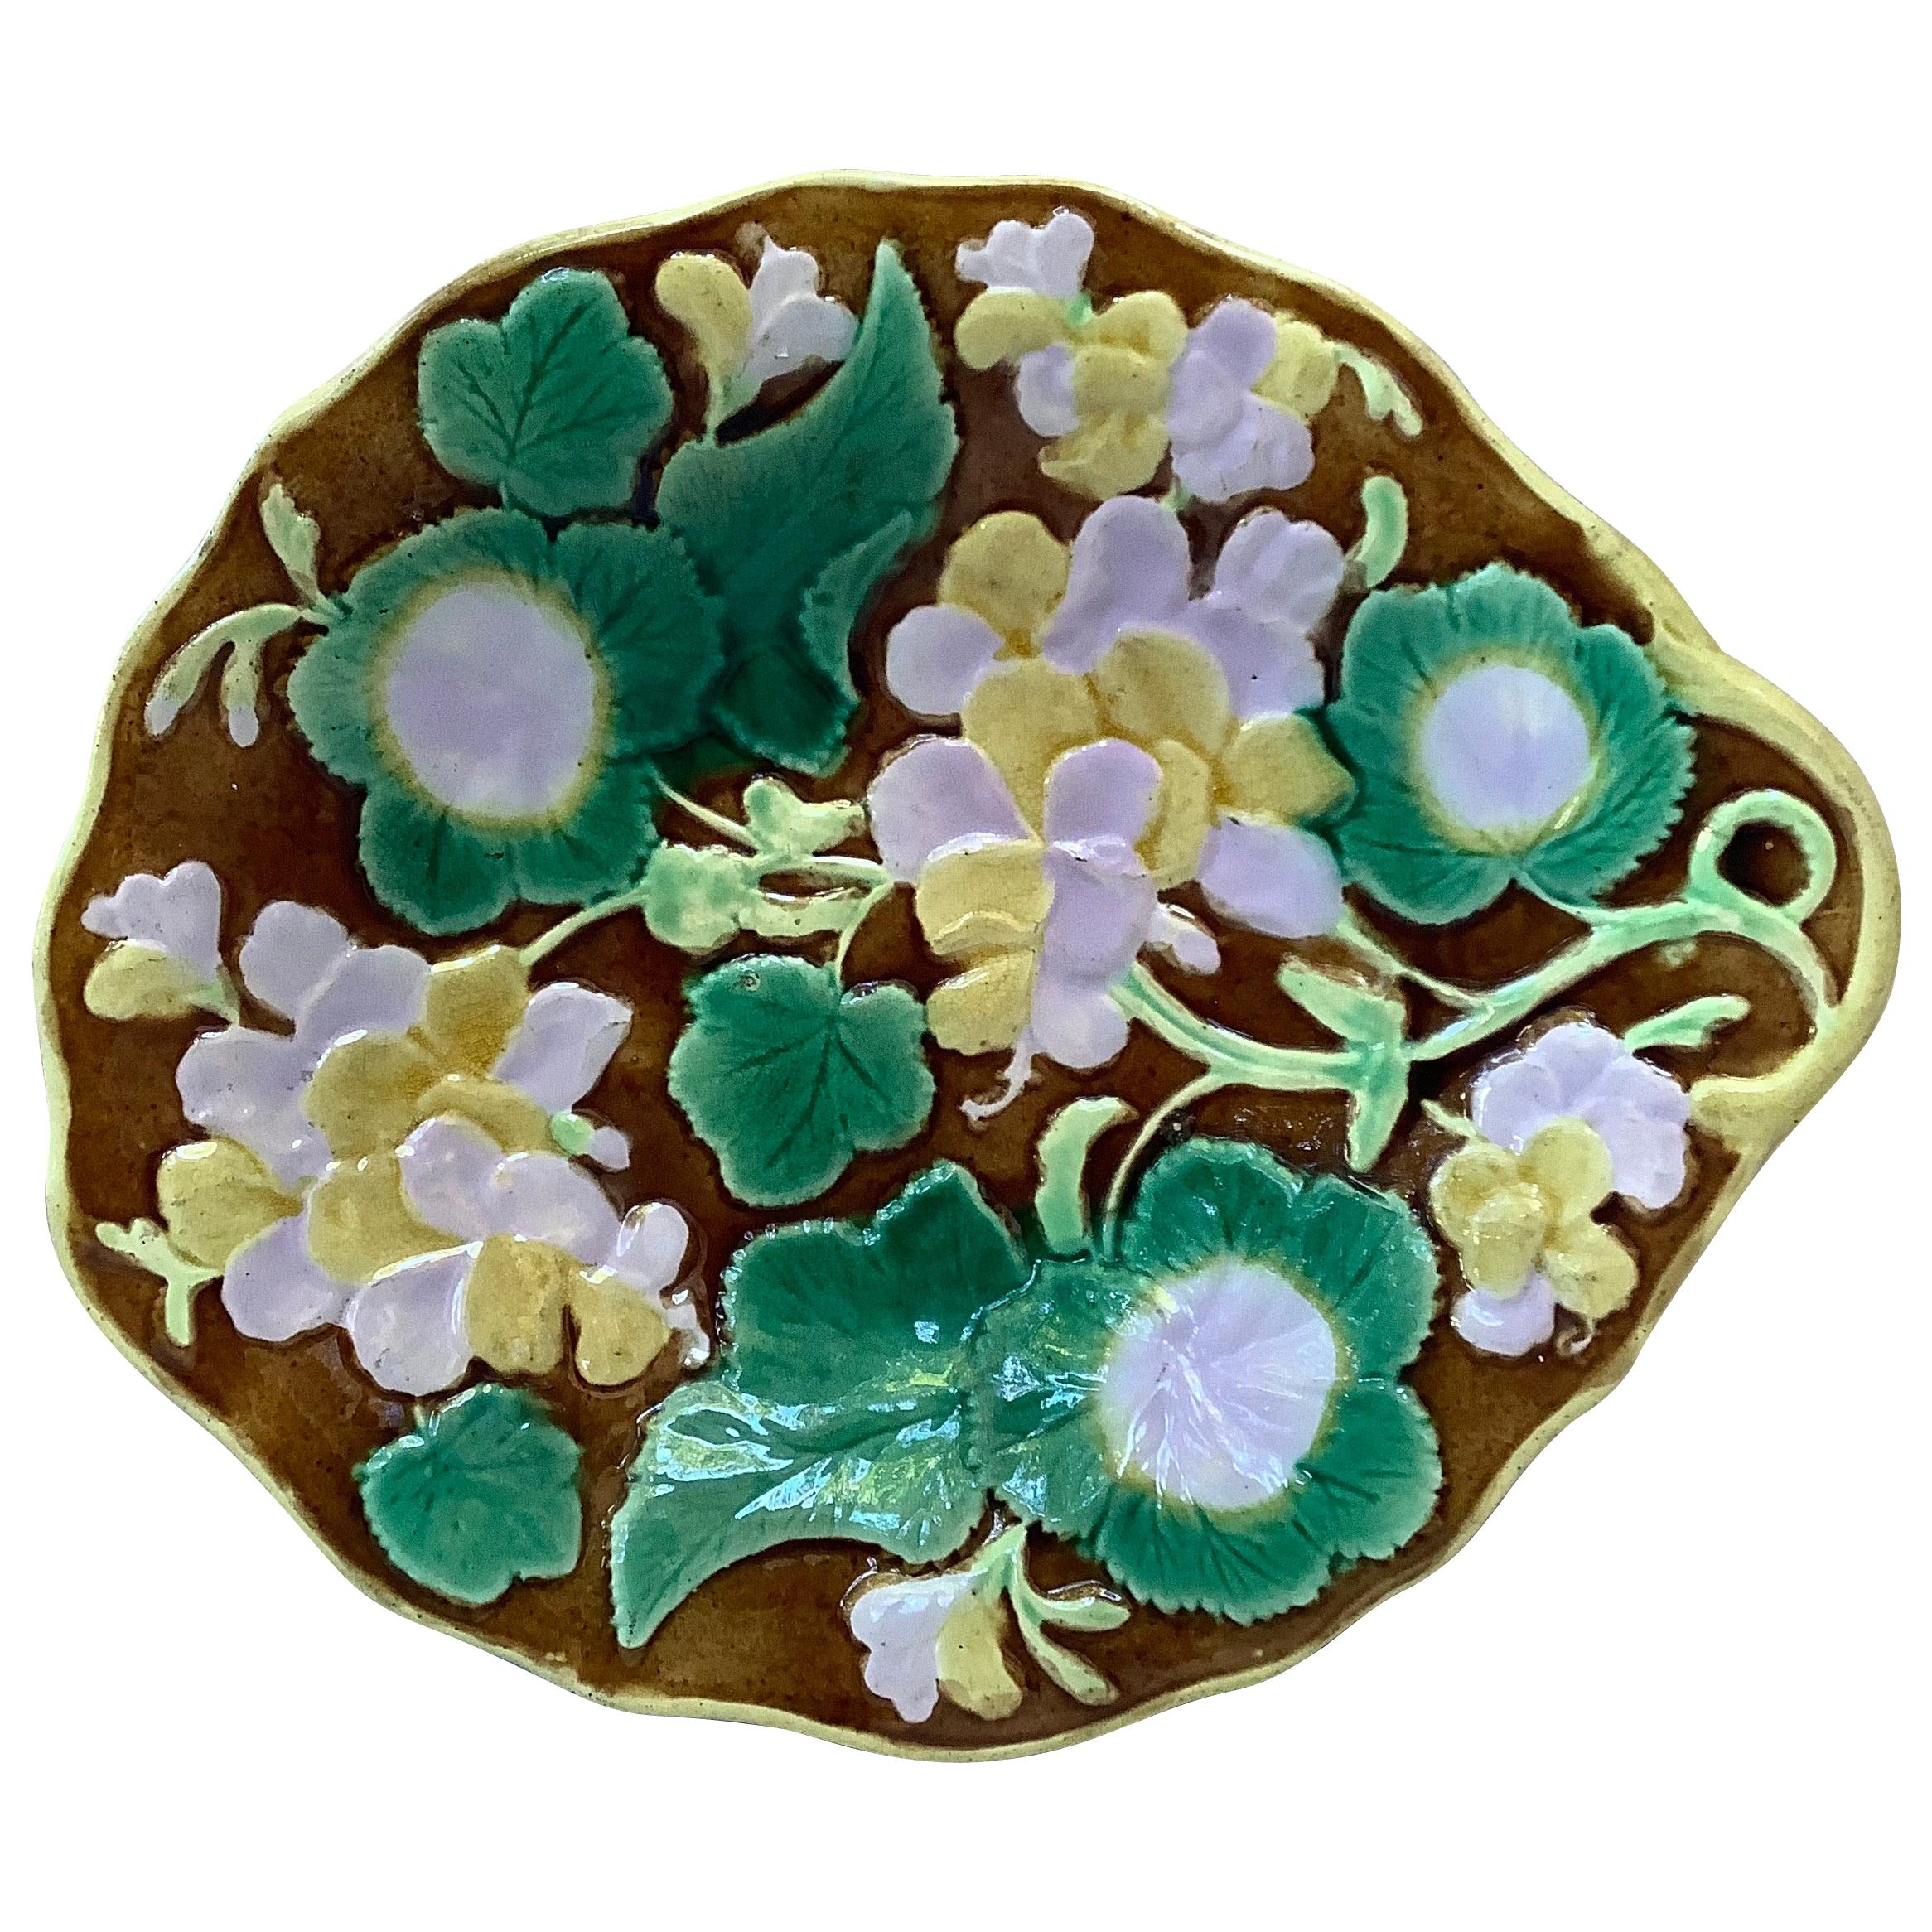 19th Century English Majolica Geranium Platter